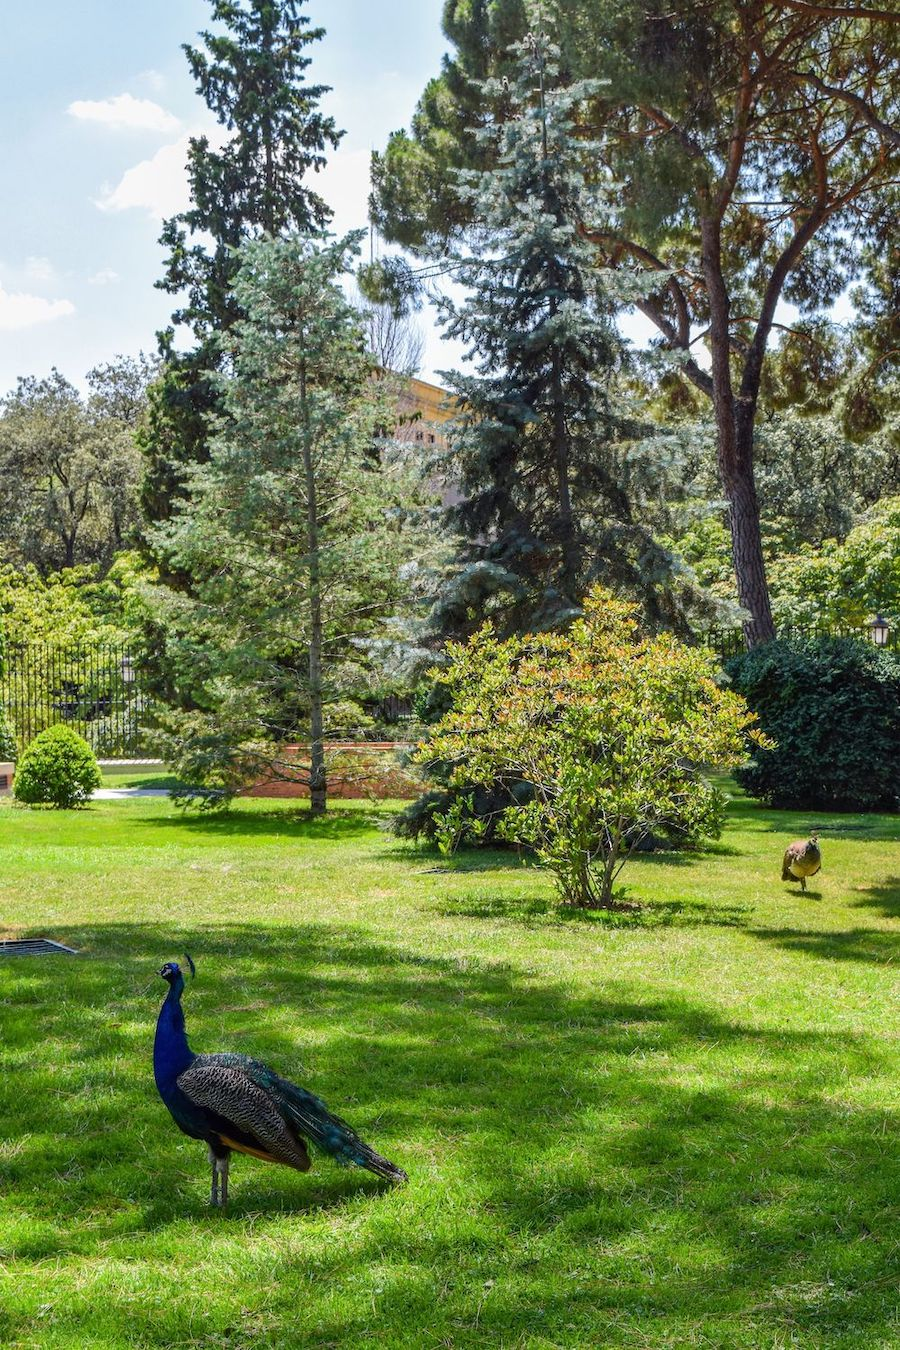 Peacocks in Madrid!